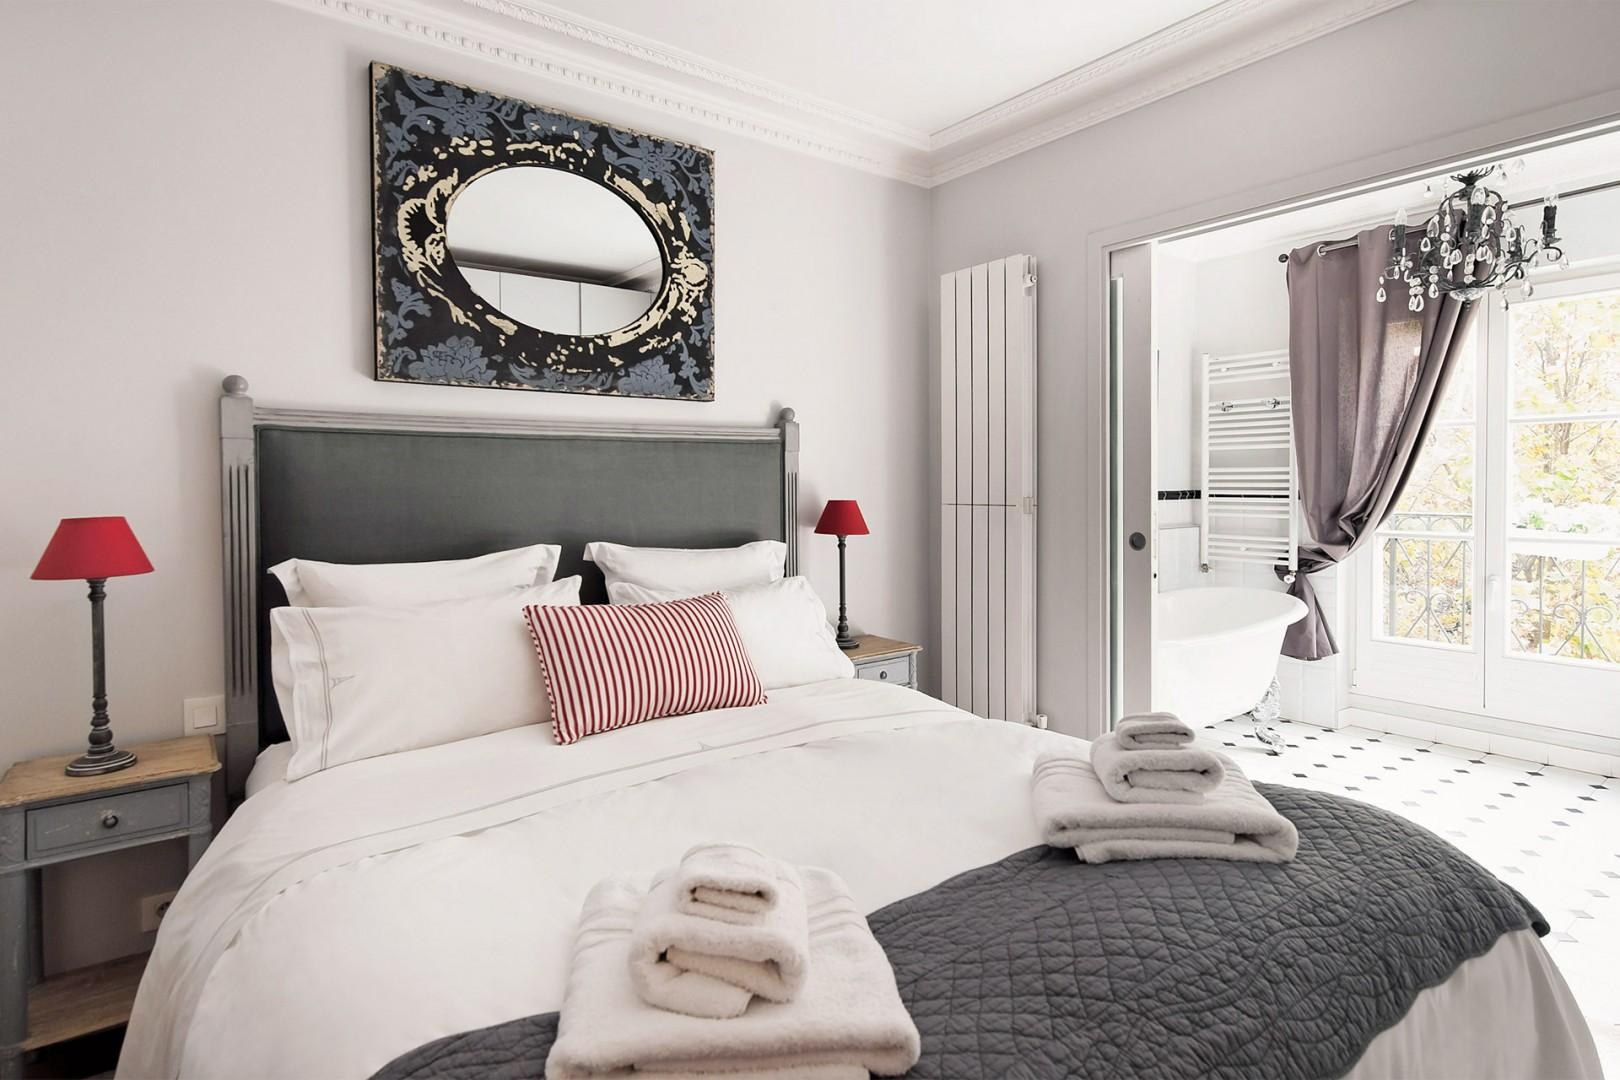 This bedroom has the most amazing en suite bathroom!